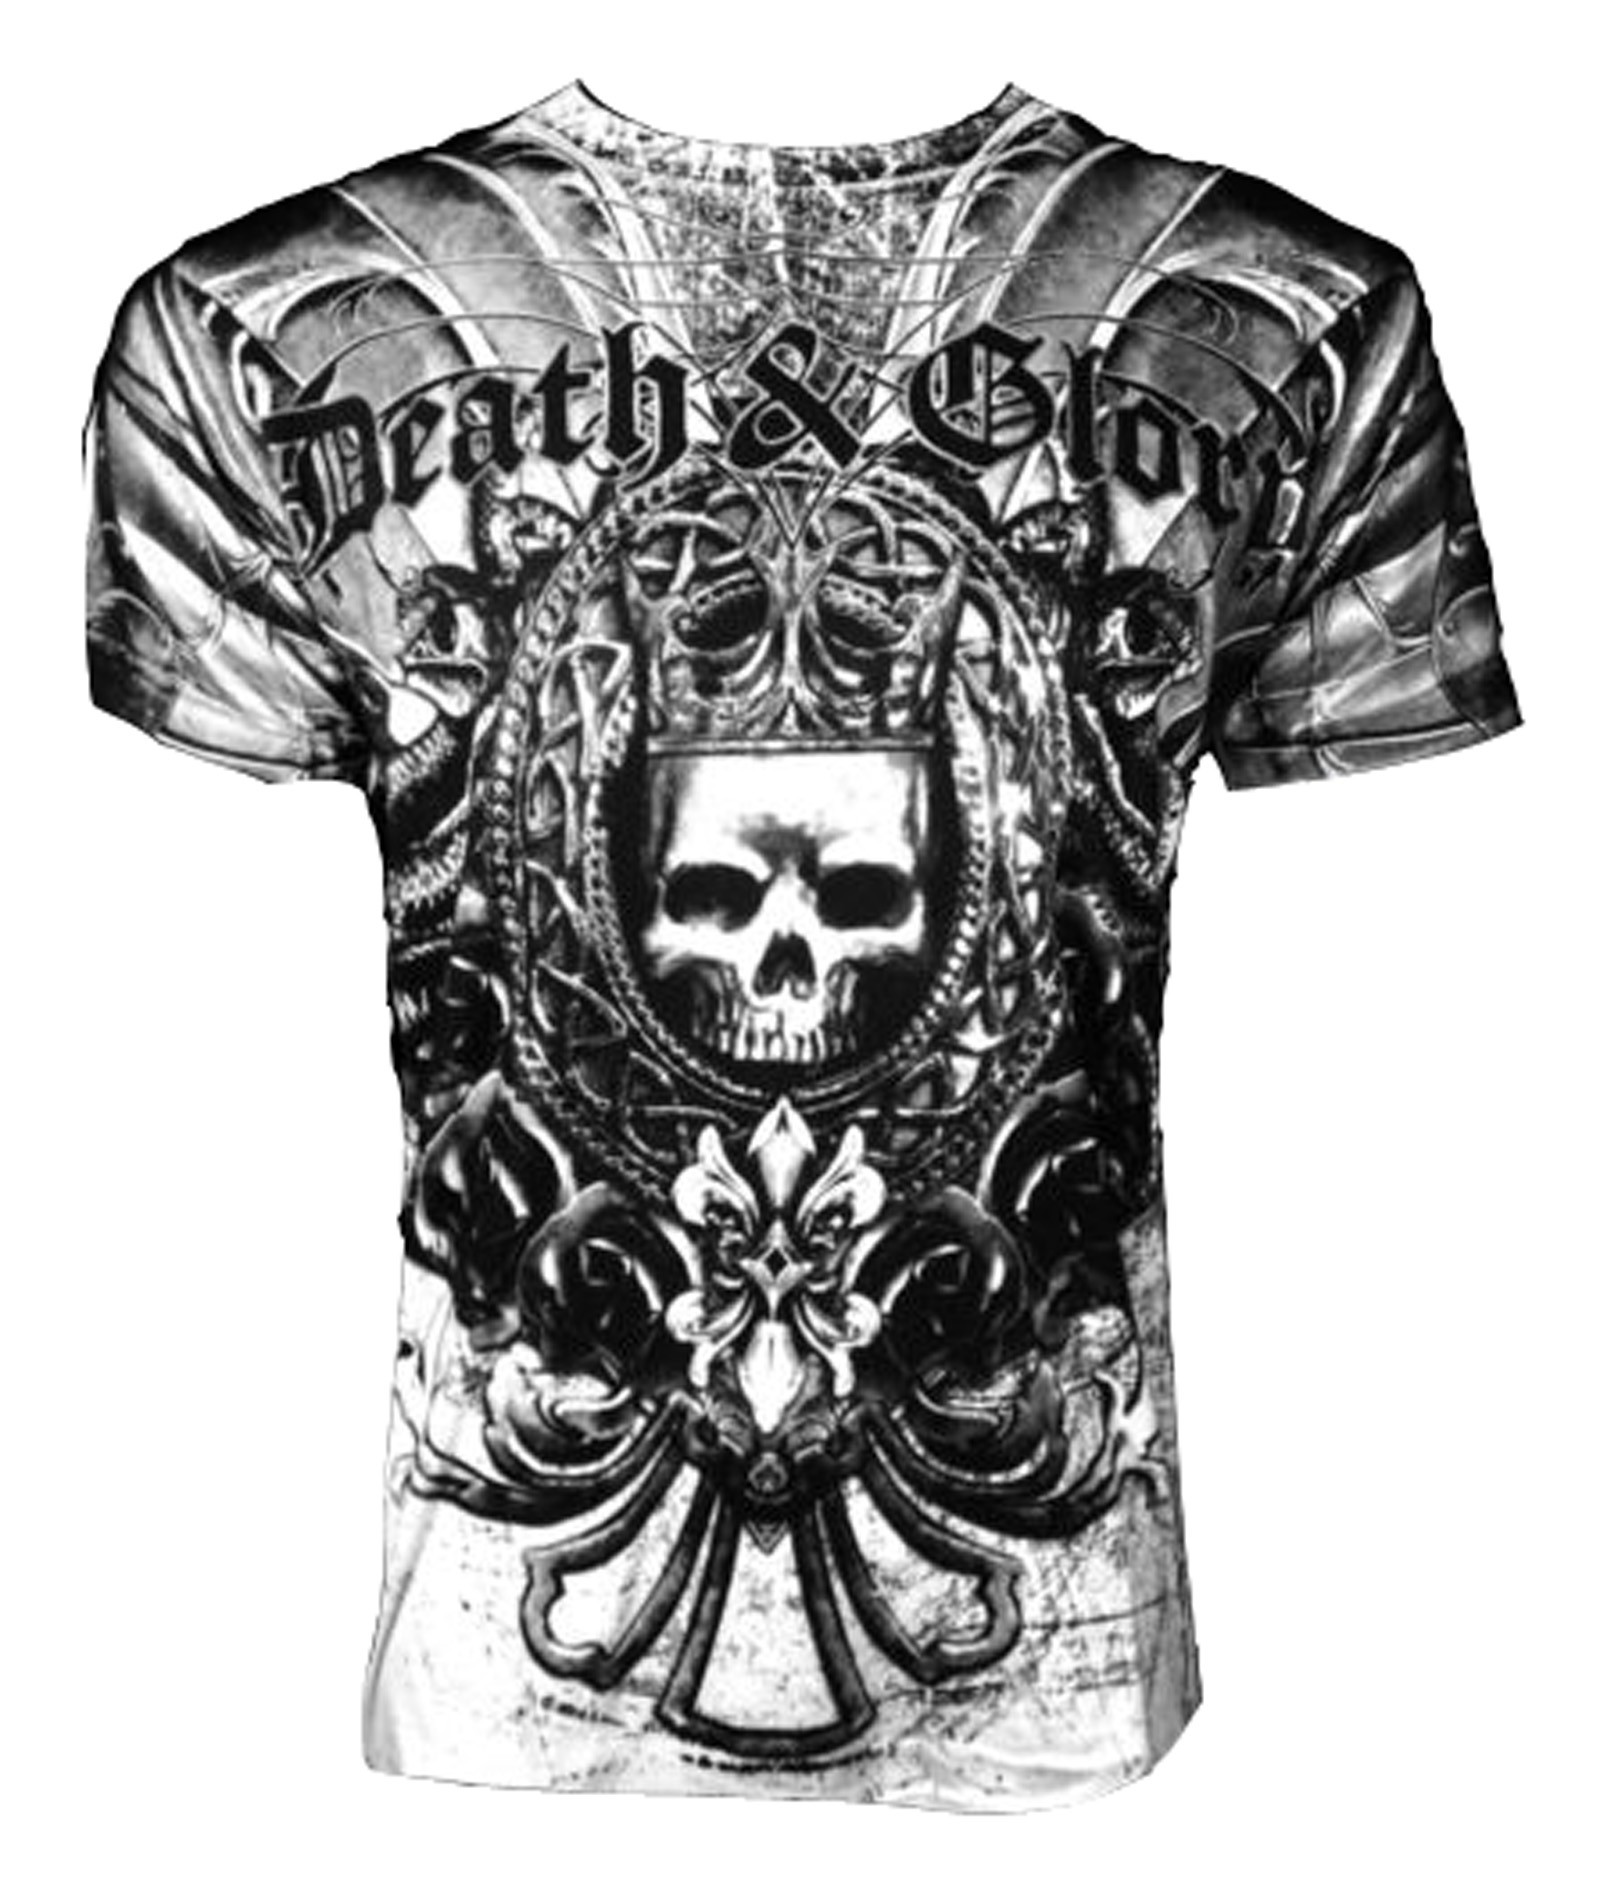 Xzavier - Death Glory T-Shirt Front